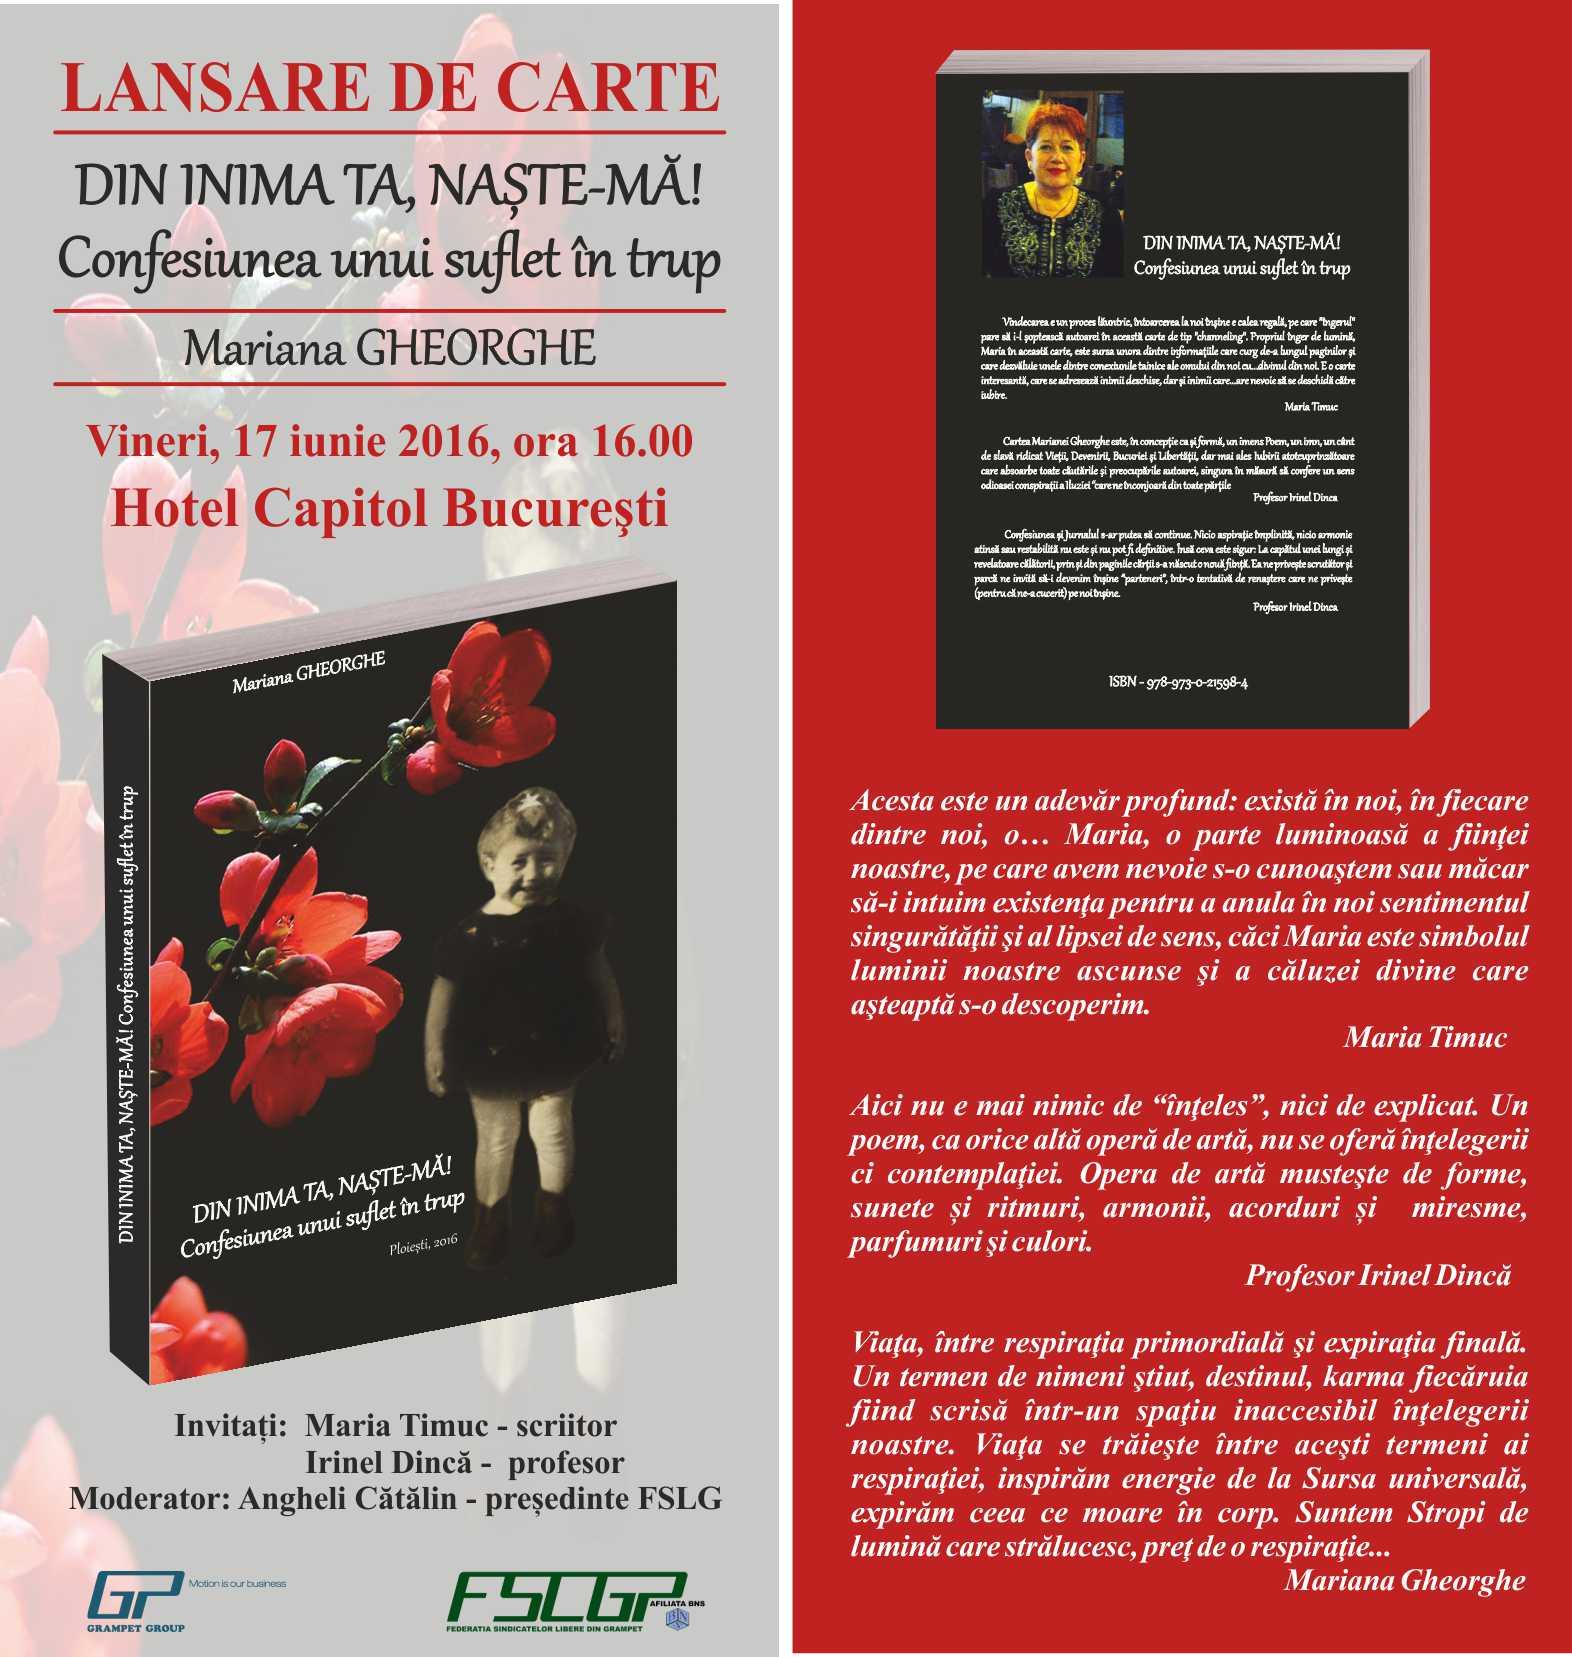 www.fsat.ro - flyer lansare carte